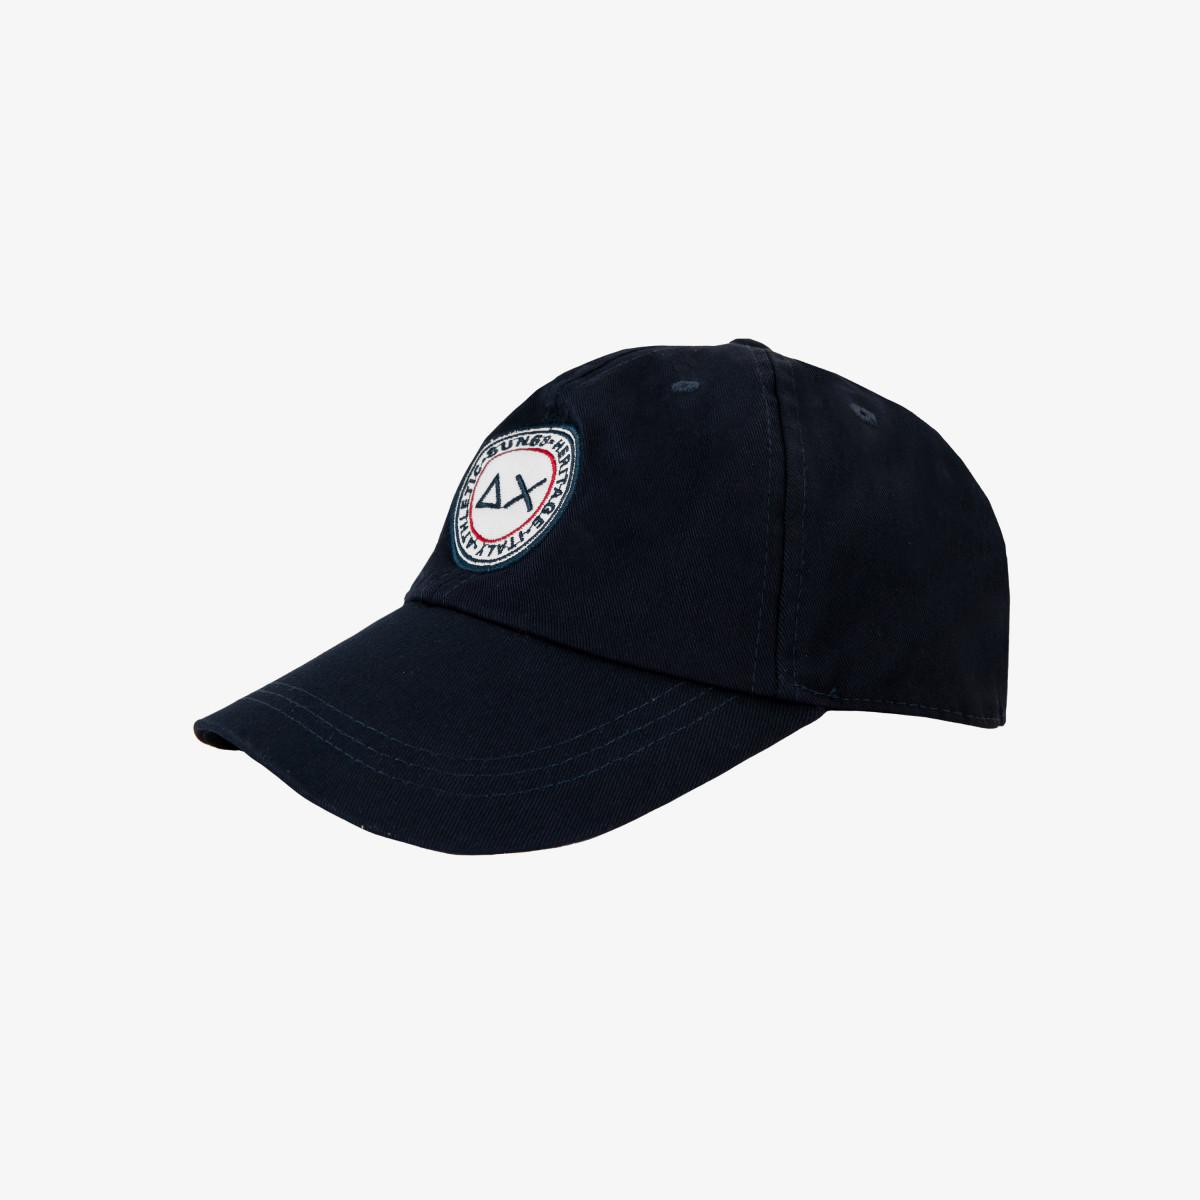 HERITAGE CAP NAVY BLUE